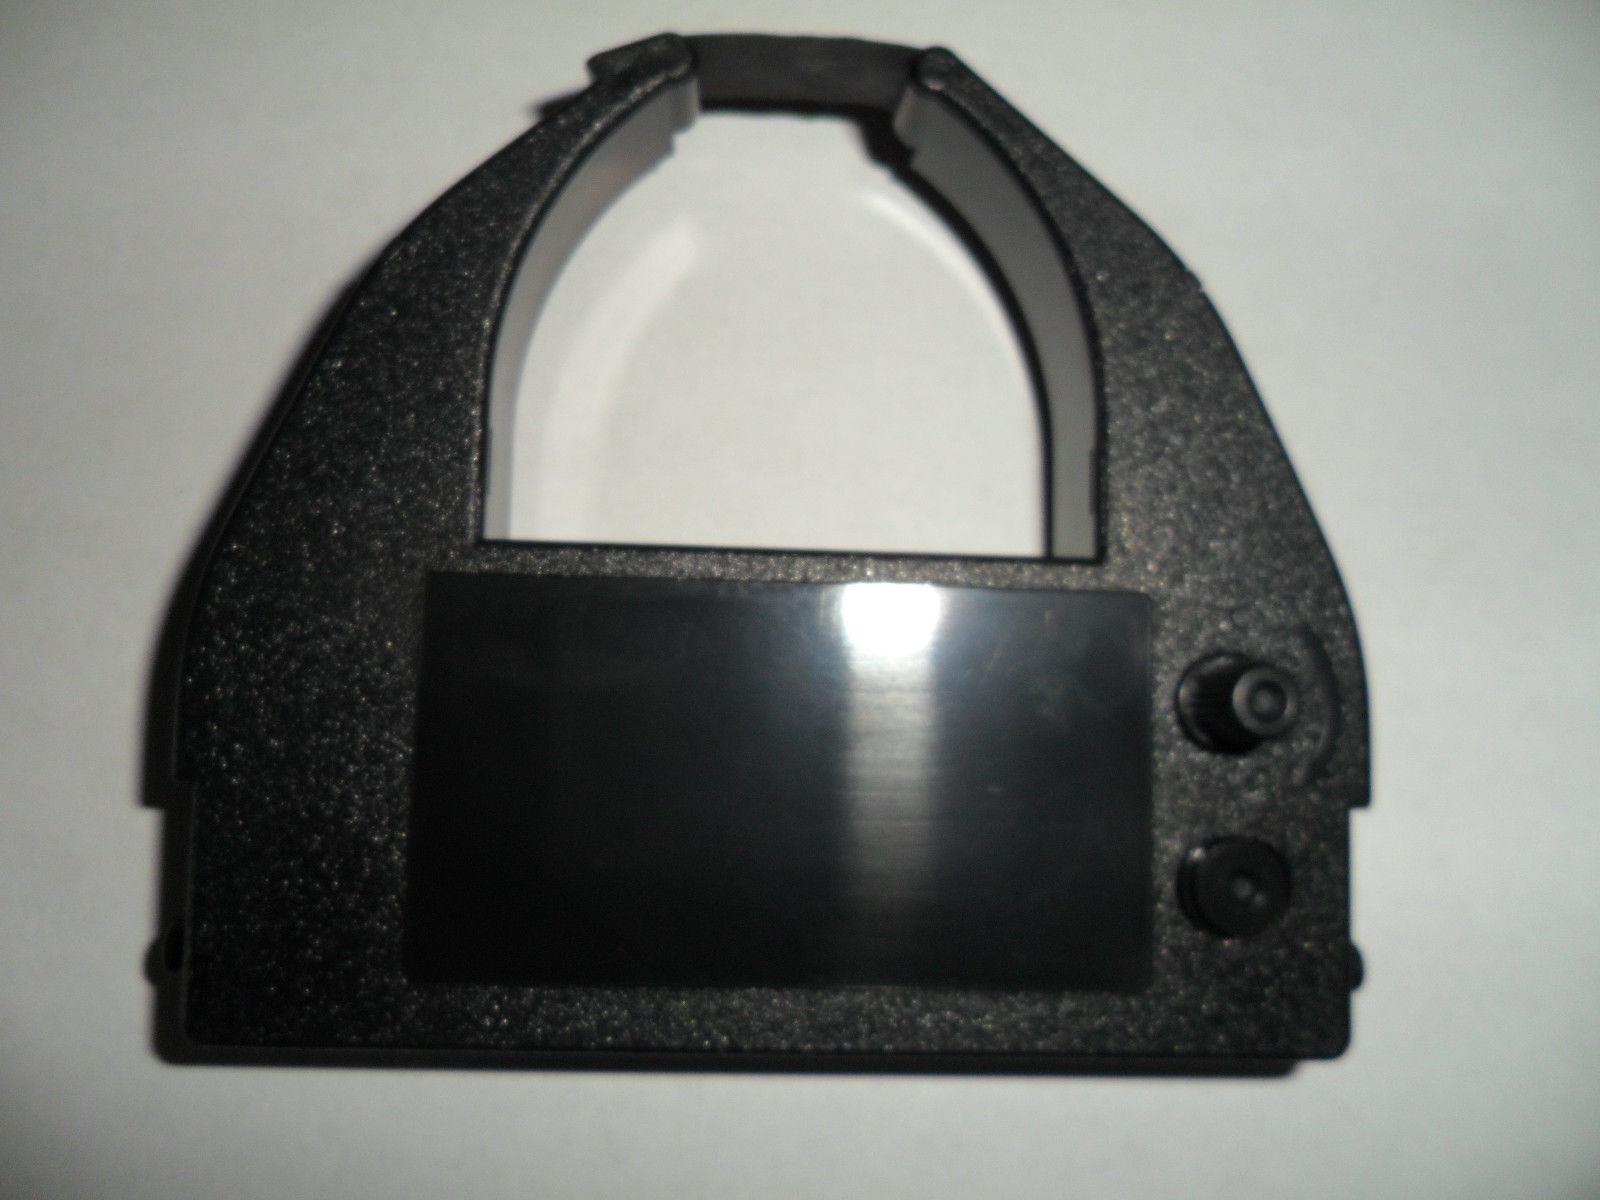 Amano Microder MJR7000 Time Clock Ribbon Black Replaces C-872304